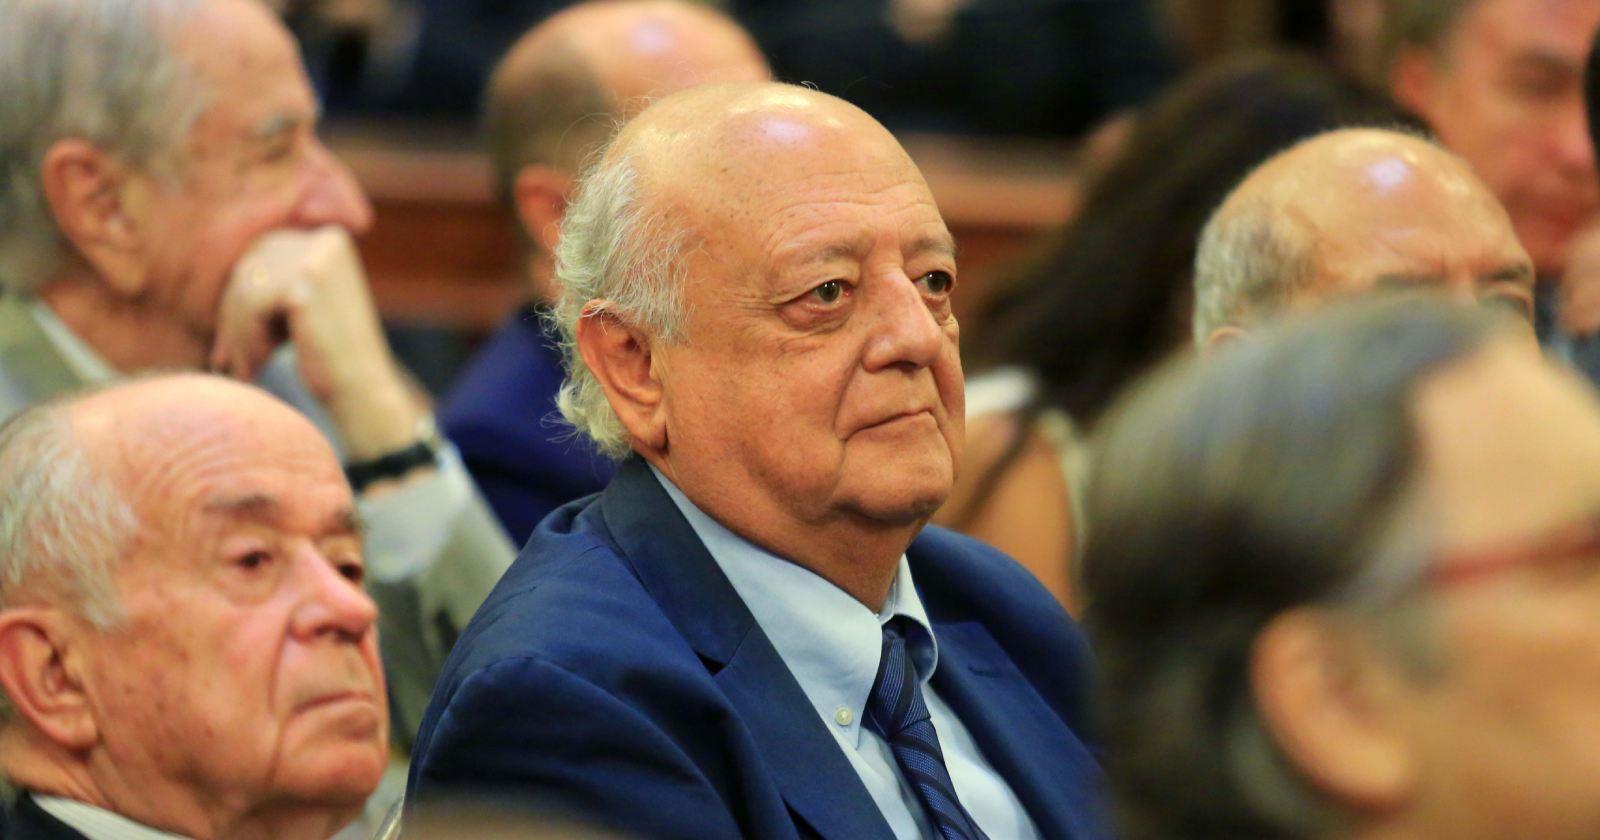 Ex embajador de Bachelet en Argentina critica reunión de opositores chilenos con Alberto Fernández